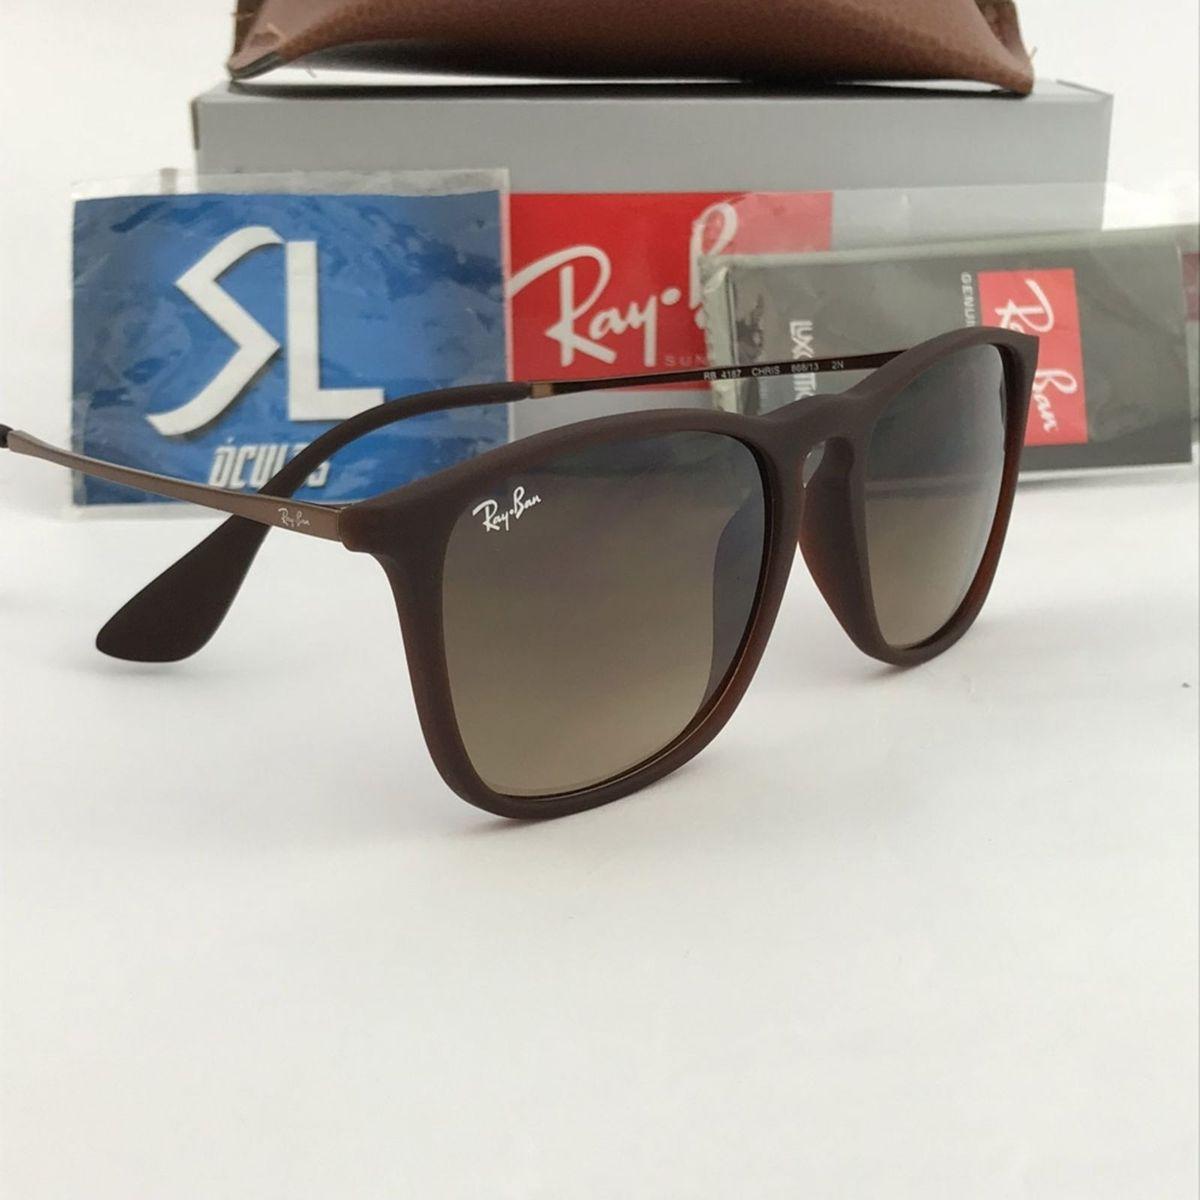 2f21006398d1a ray ban chris - óculos ray-ban.  Czm6ly9wag90b3muzw5qb2vplmnvbs5ici9wcm9kdwn0cy84ntm0nzg2l2u0zjbizdywmmzkmmizyzc1nja4mge2owi4yzgzmwjmlmpwzw  ...